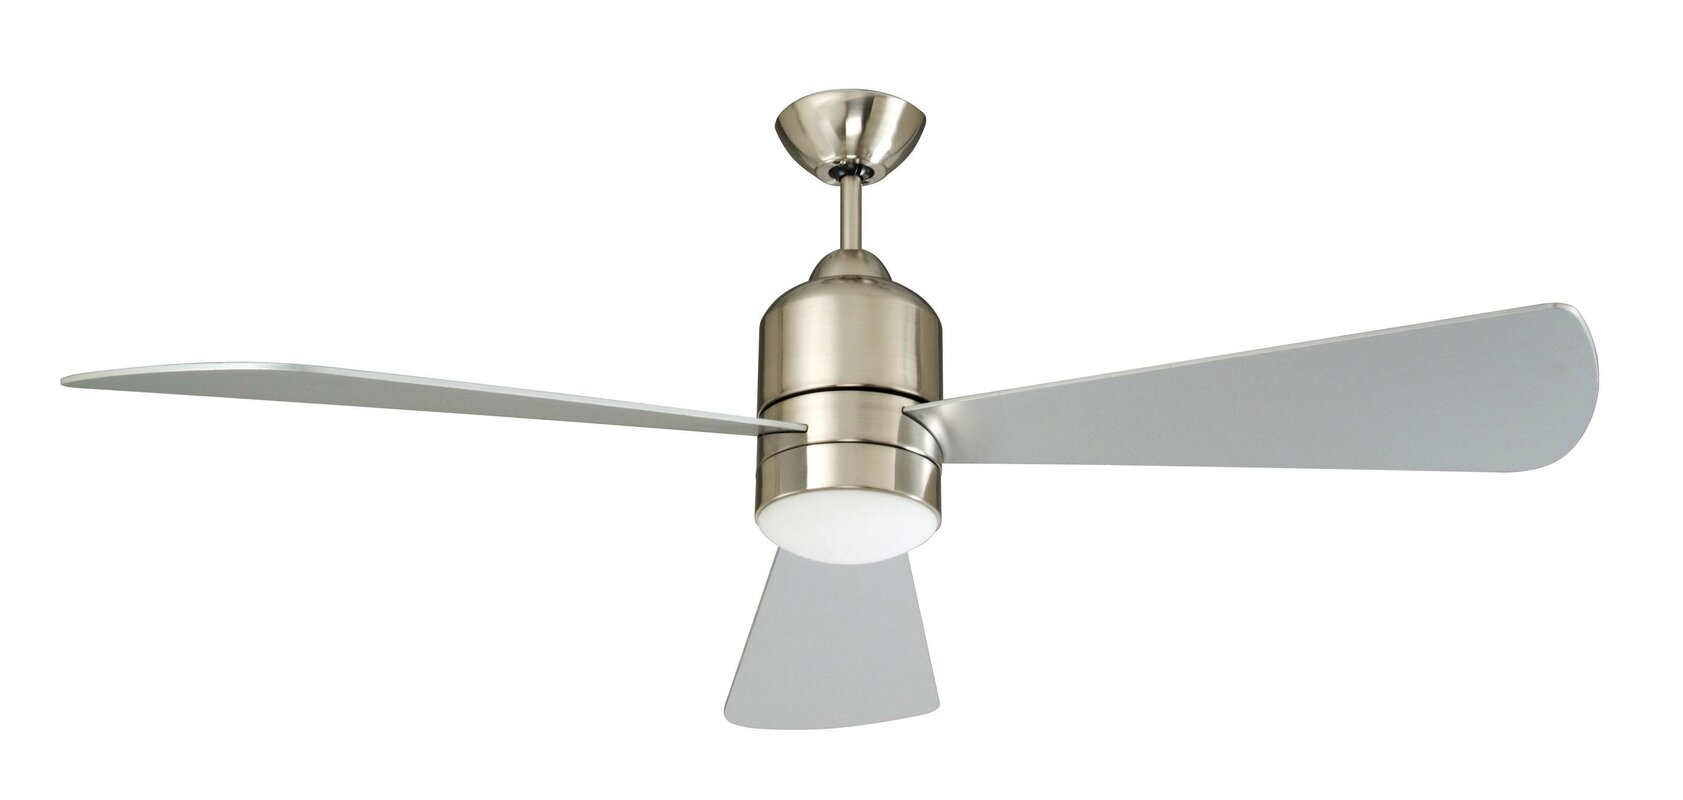 "concord fans 60"" decca 3-blade ceiling fan & reviews | wayfair"